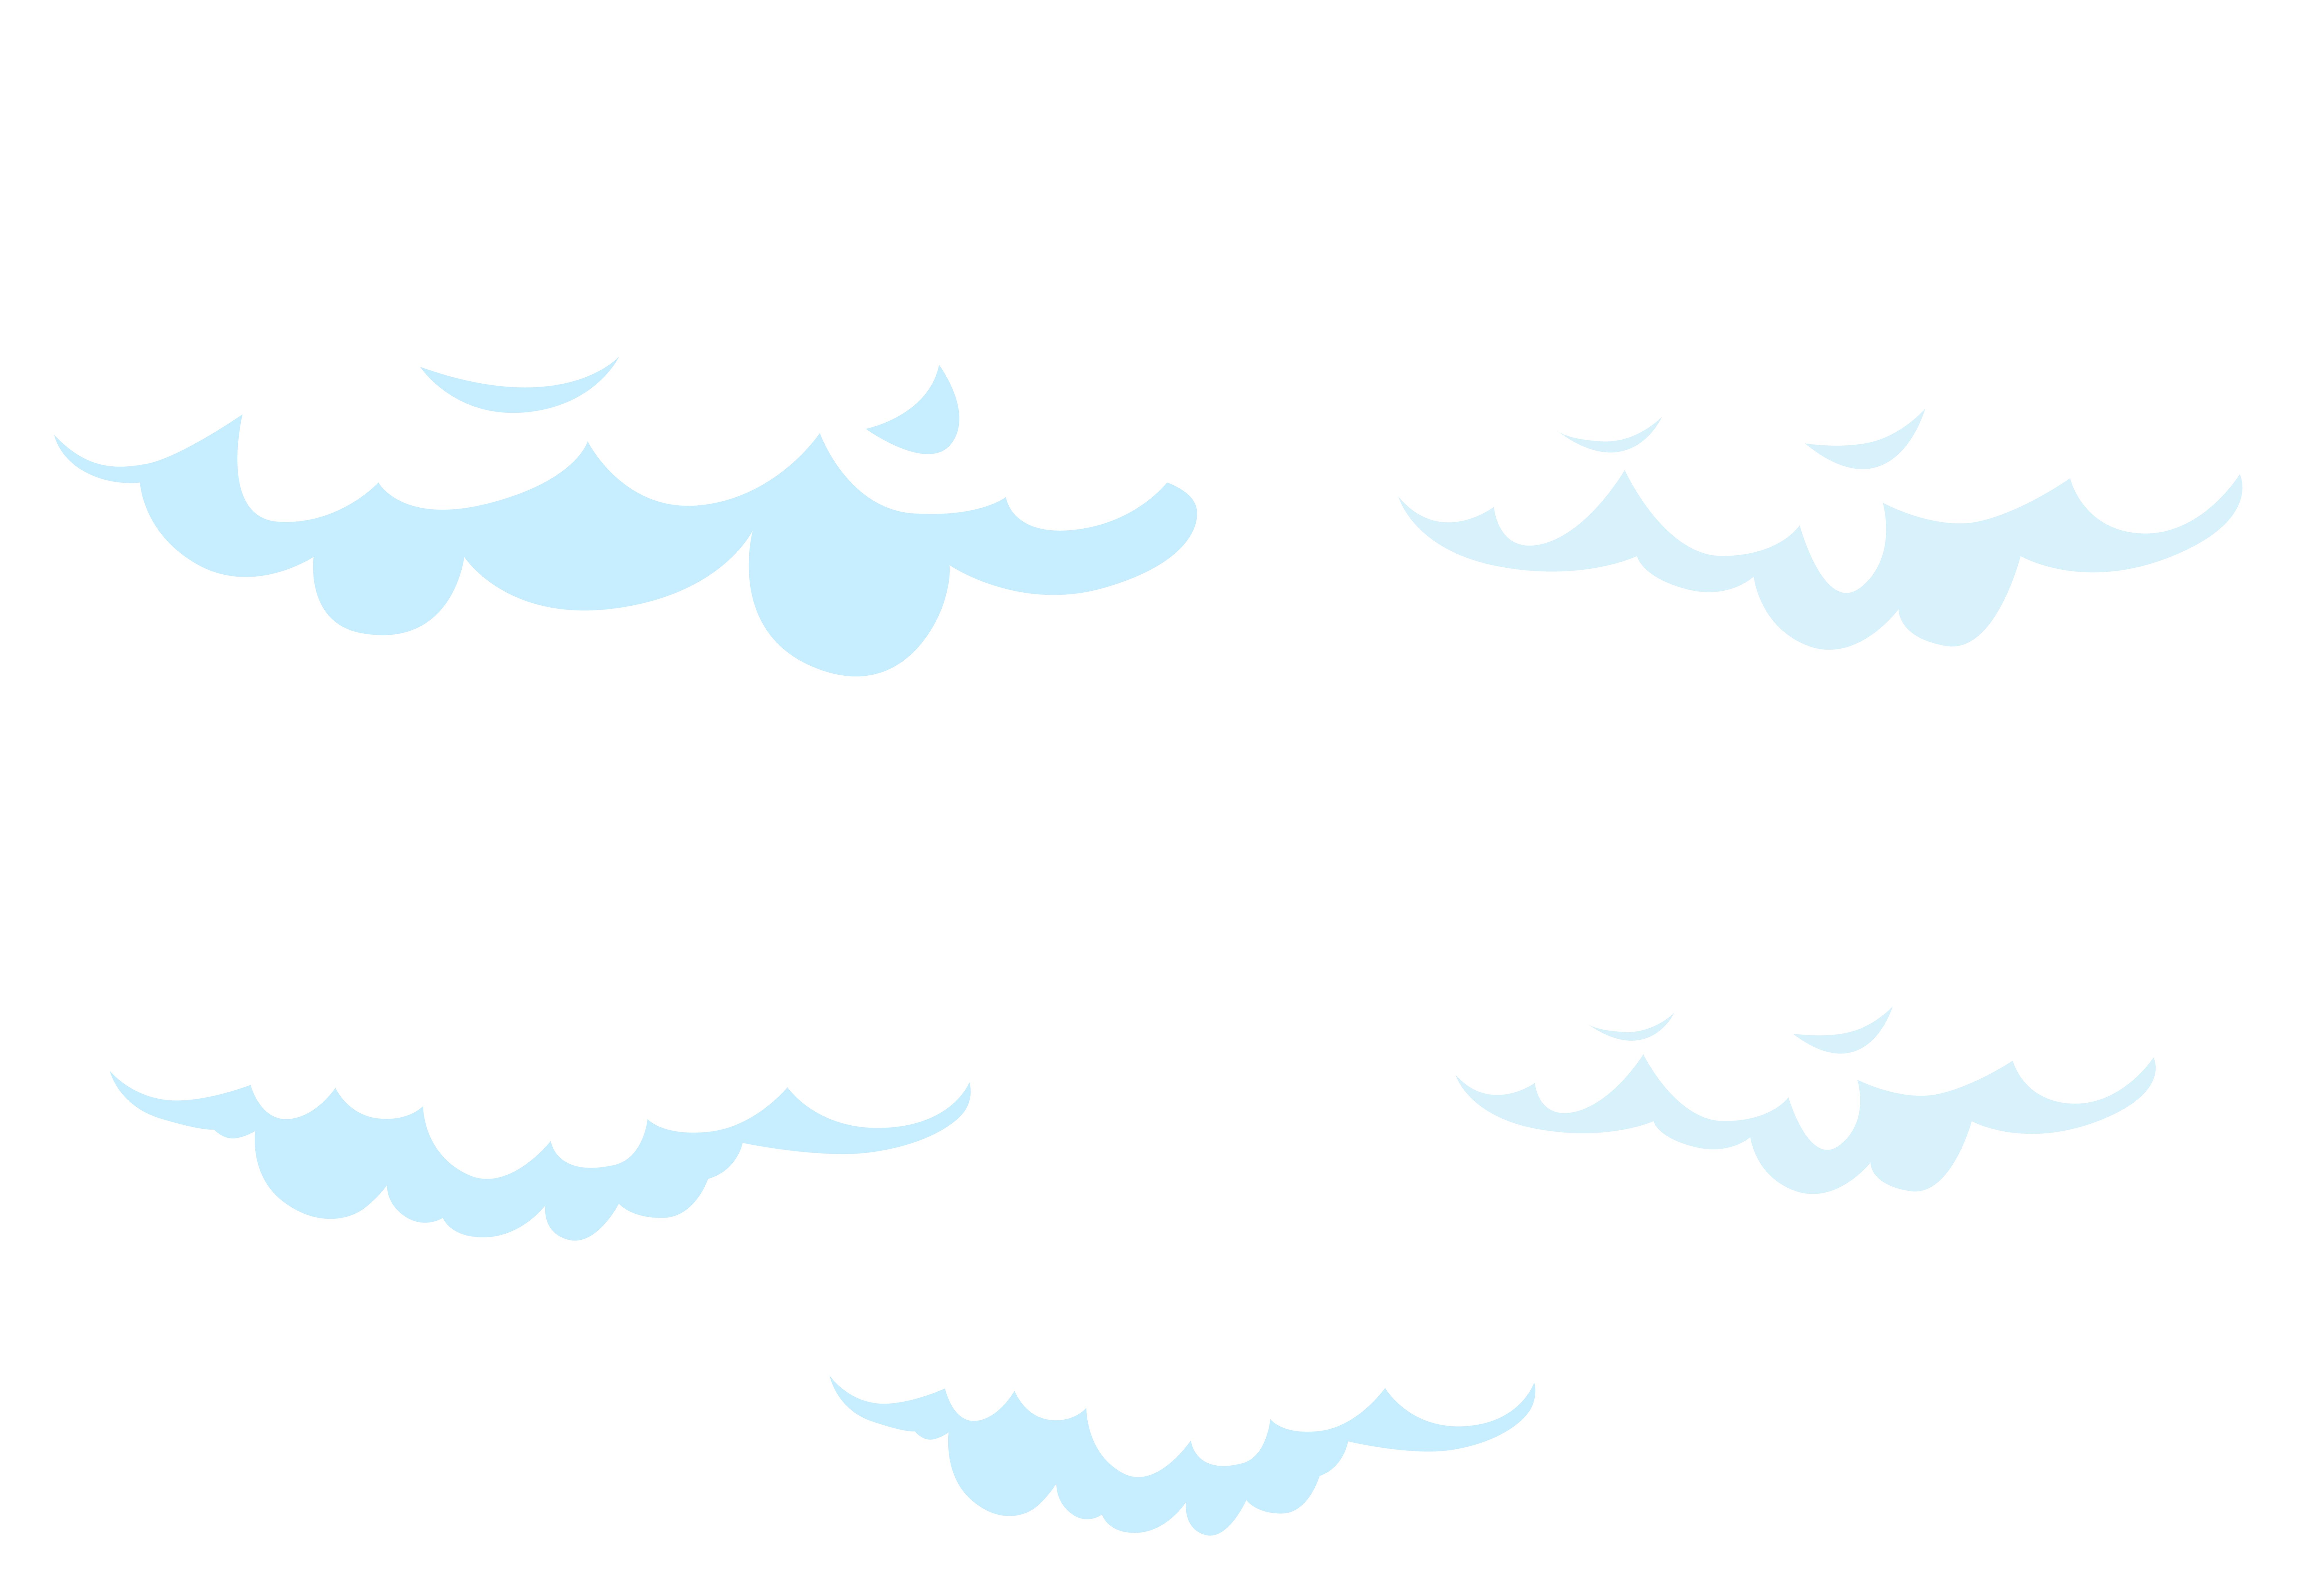 Cloud clipart png clip art transparent stock Cartoon Clouds Set Transparent PNG Clip Art Image | Gallery ... clip art transparent stock